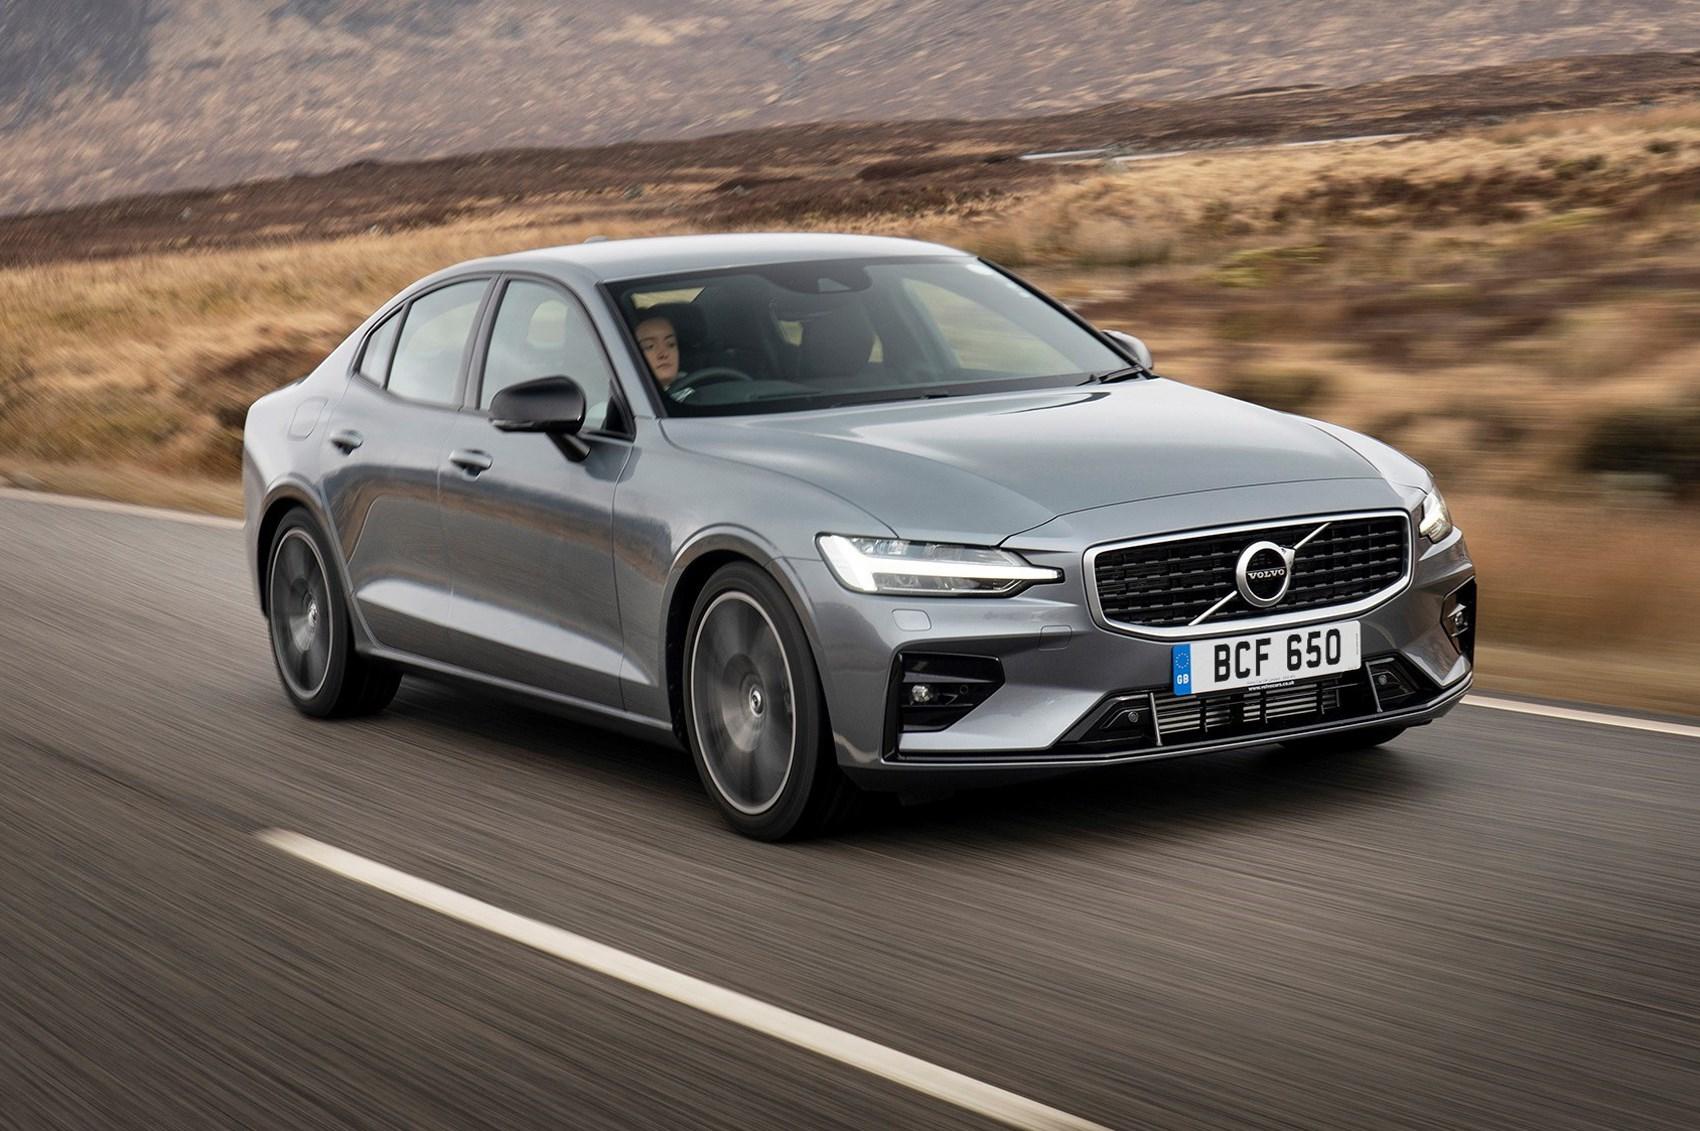 New Volvo S60 review: the range, driven | CAR Magazine